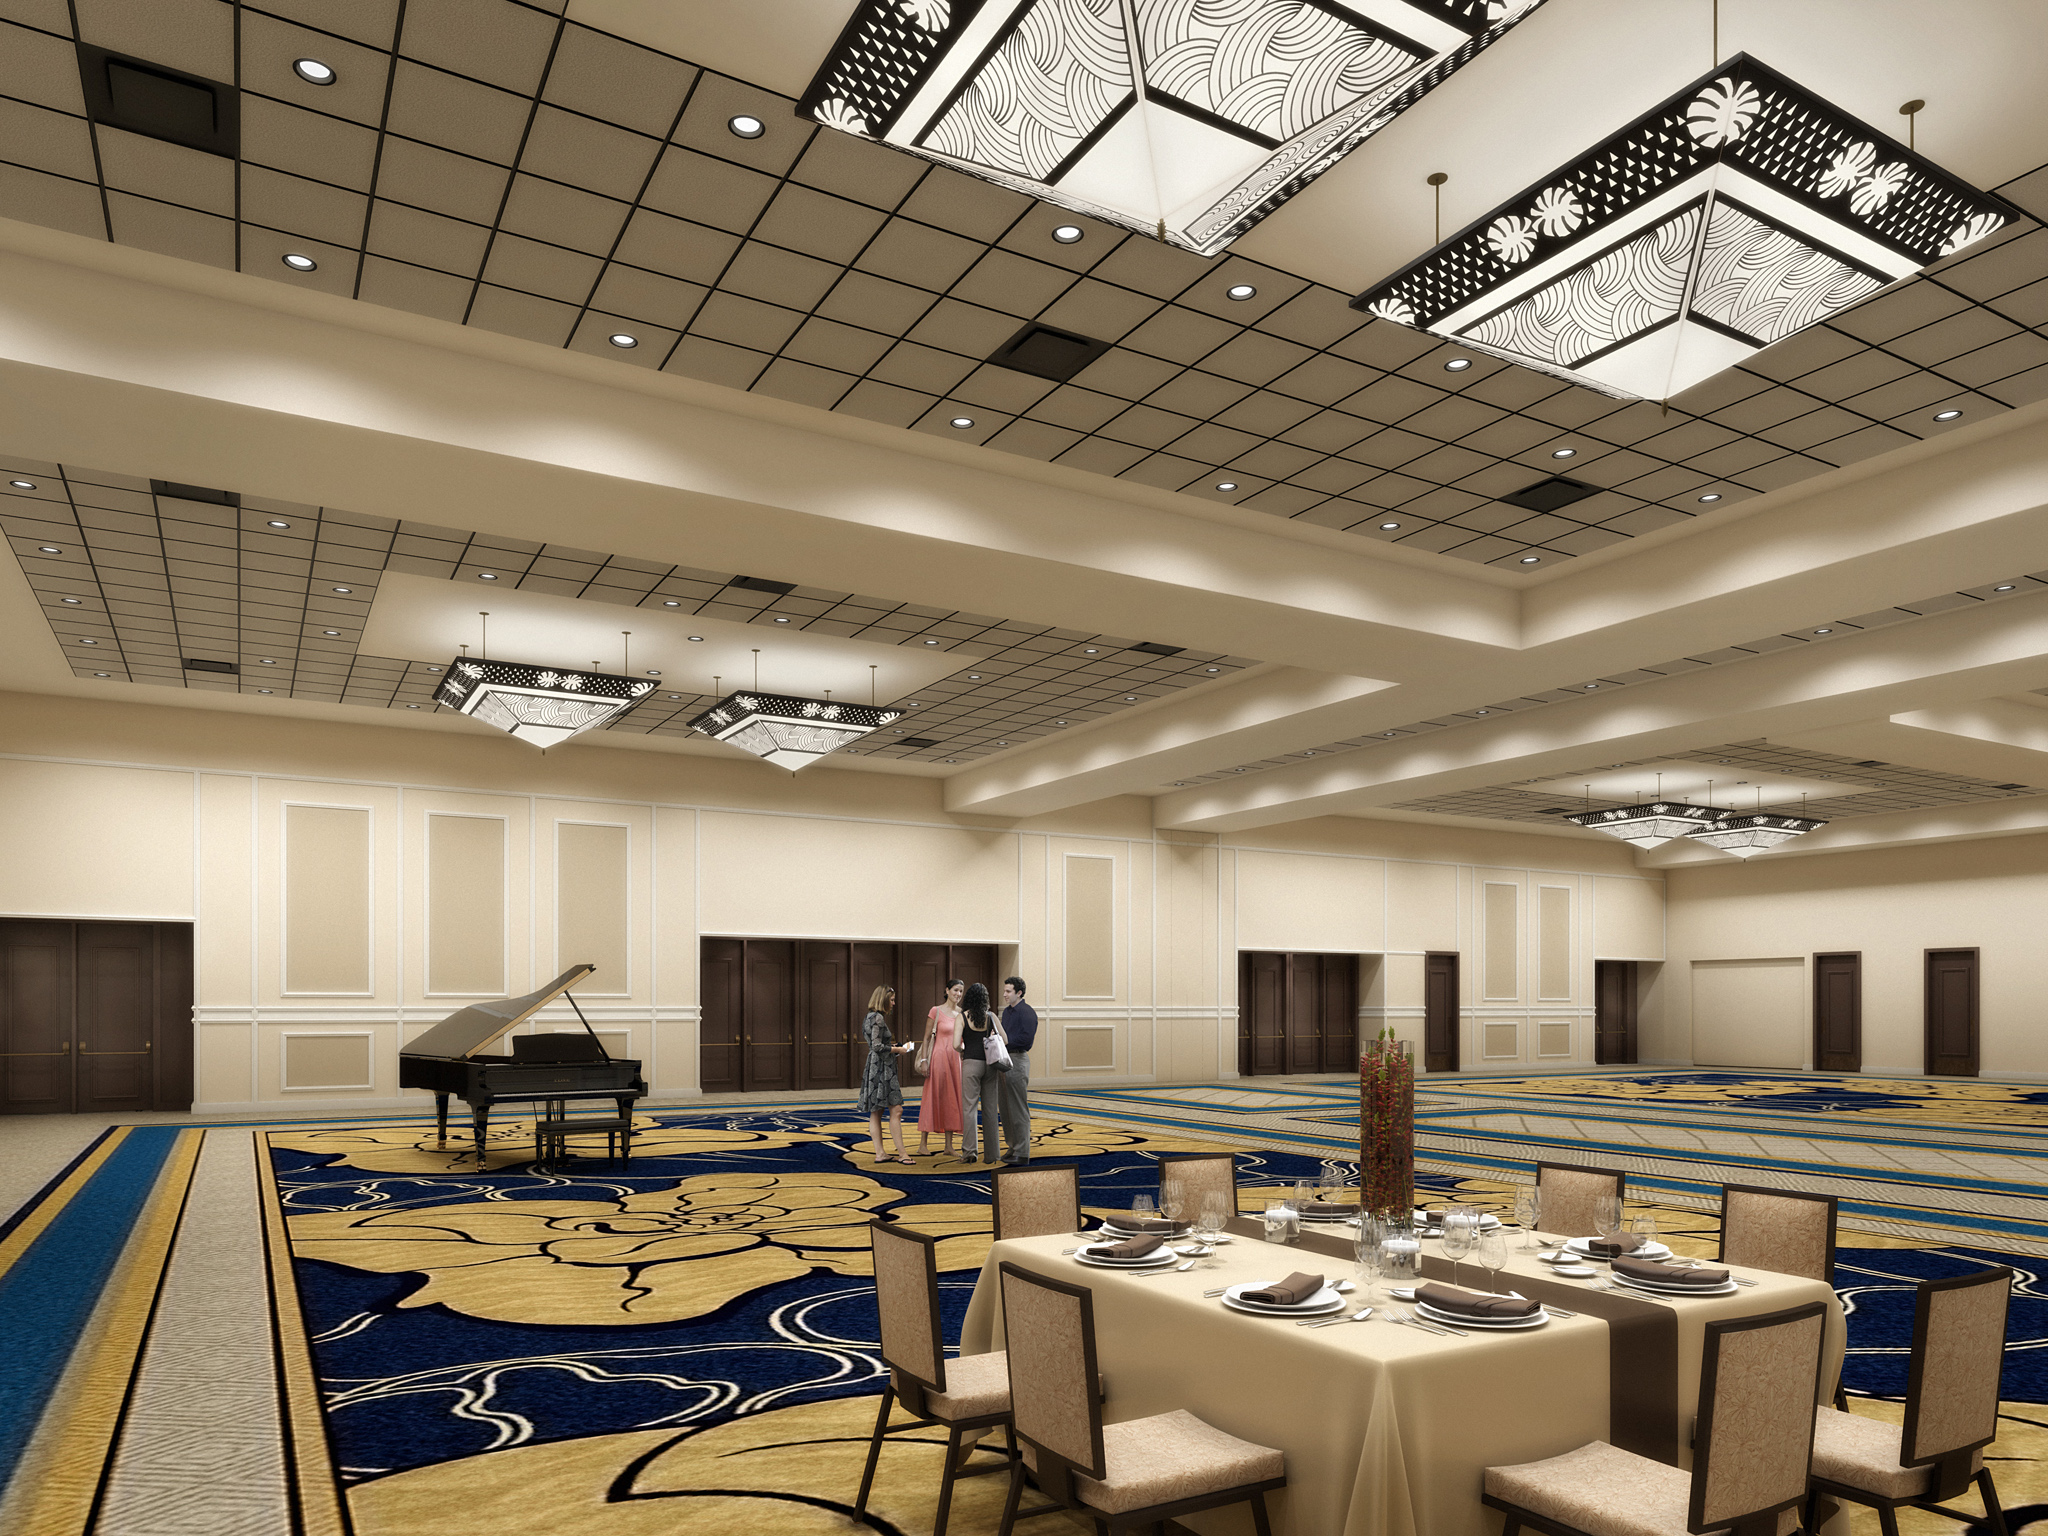 Kona Ballroom 12-22-11.jpg